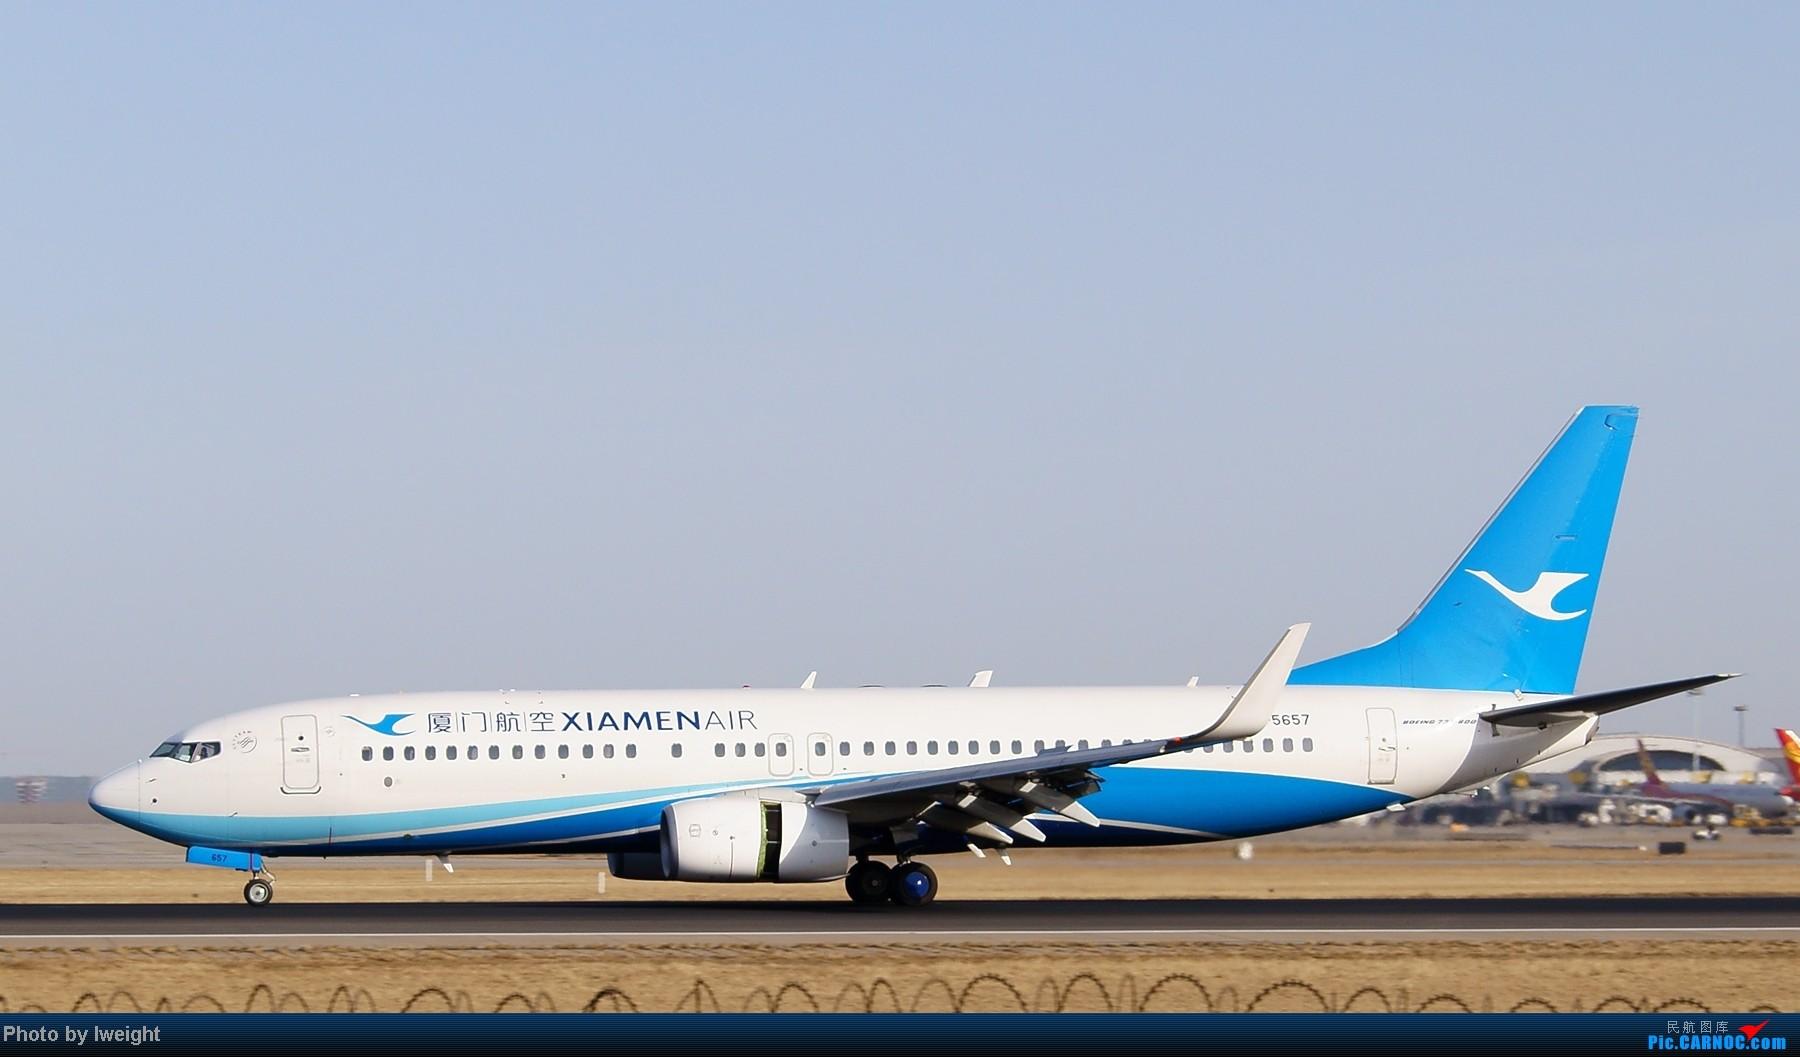 Re:[原创]春节期间首都机场拍机汇报 BOEING 737-800 B-5657 中国北京首都机场